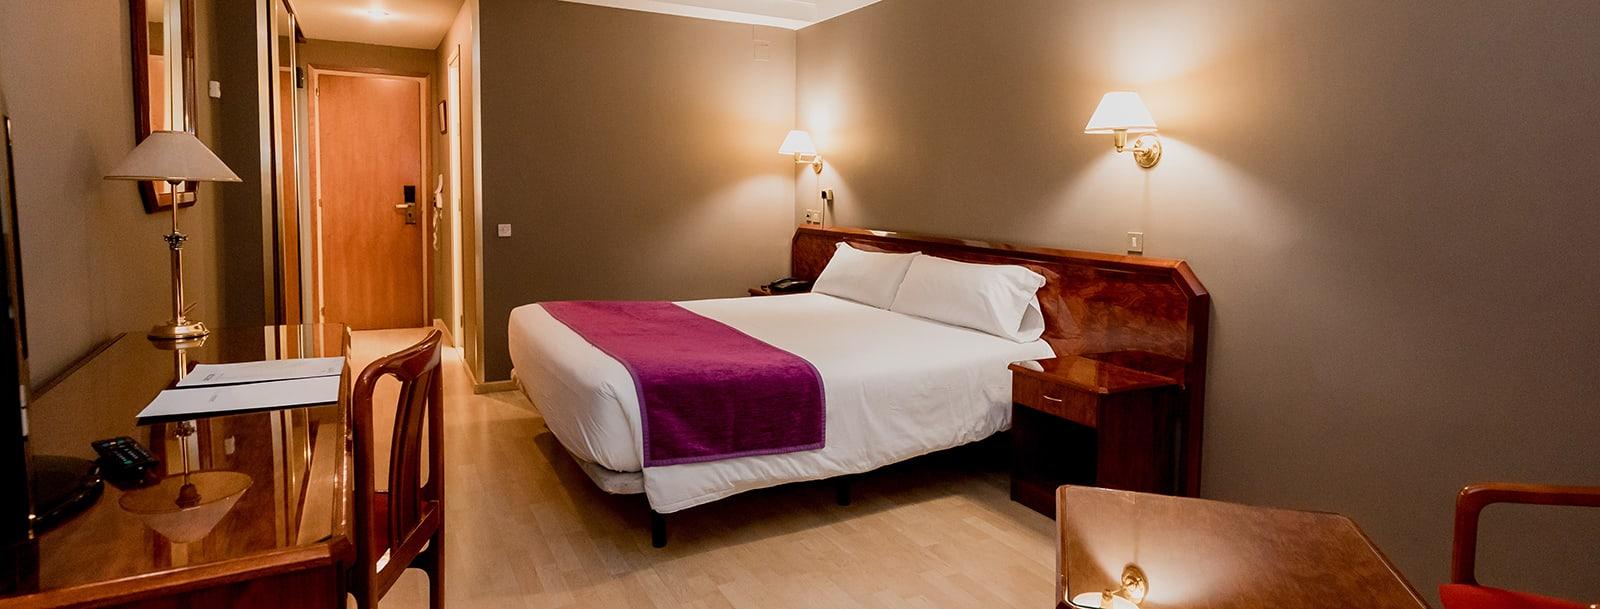 Rooms Tulip Inn Andorra Delfos hotel